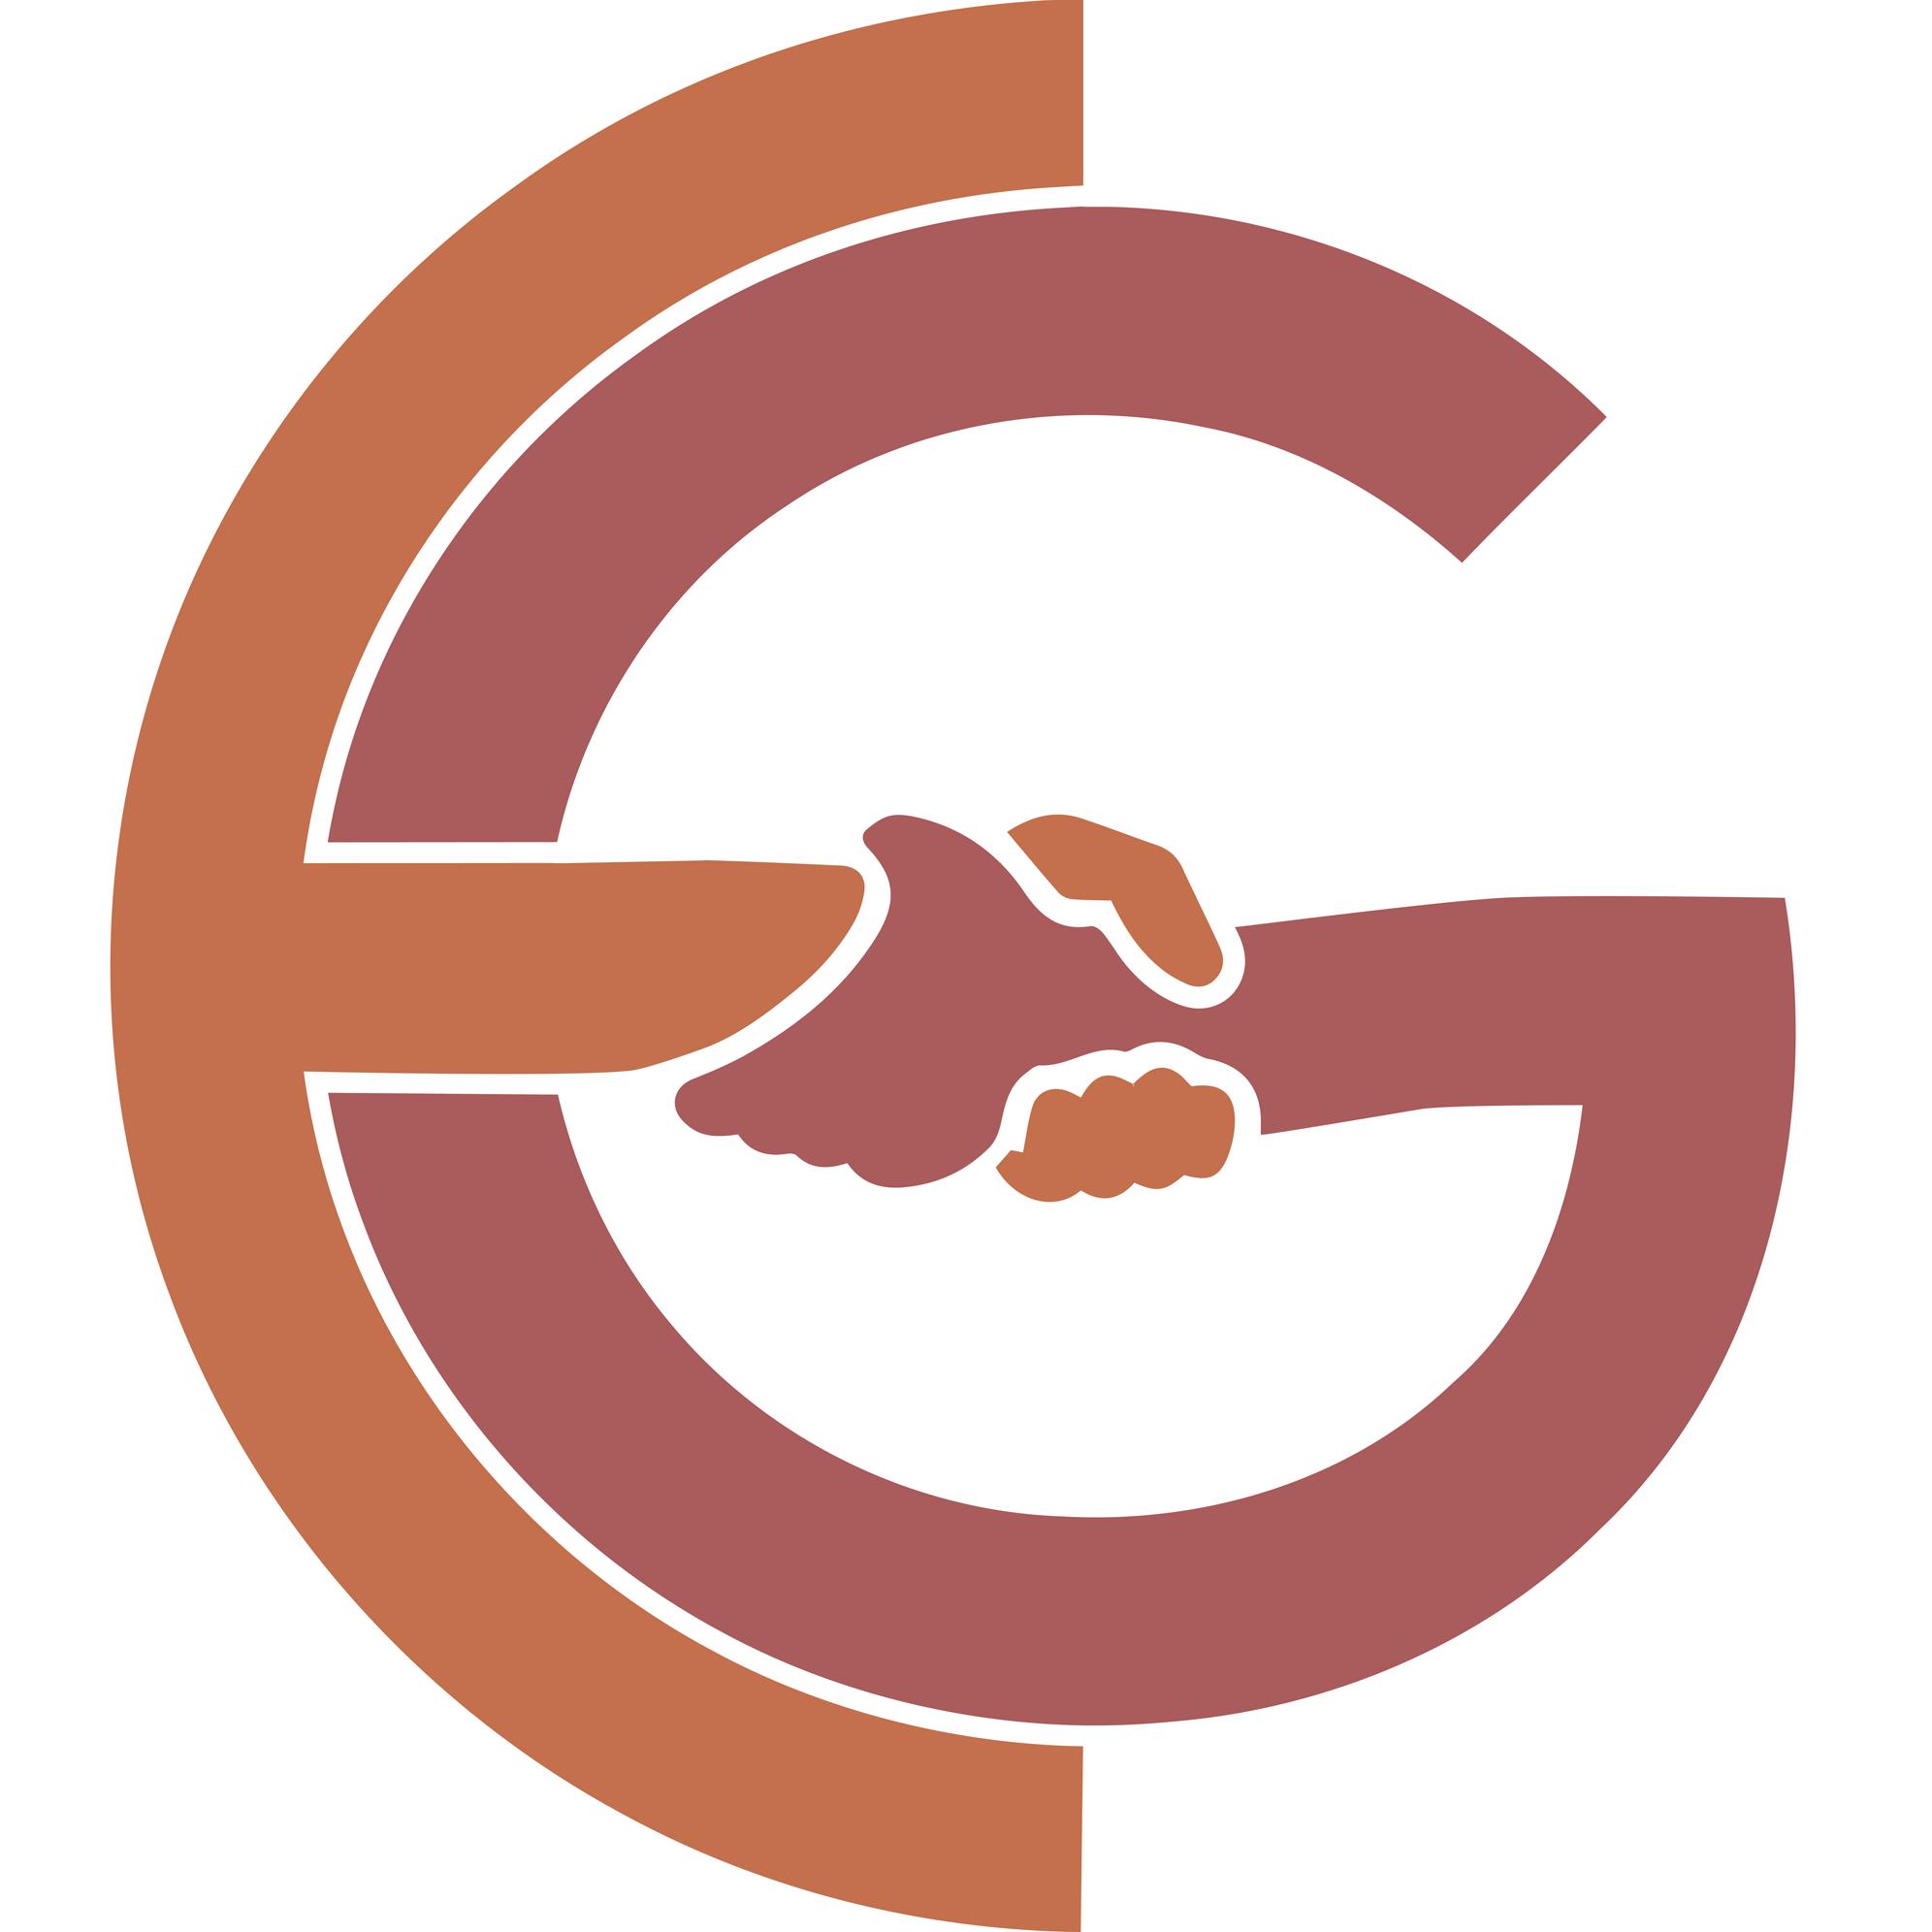 Logo Einfach Gemeinsam e.V.